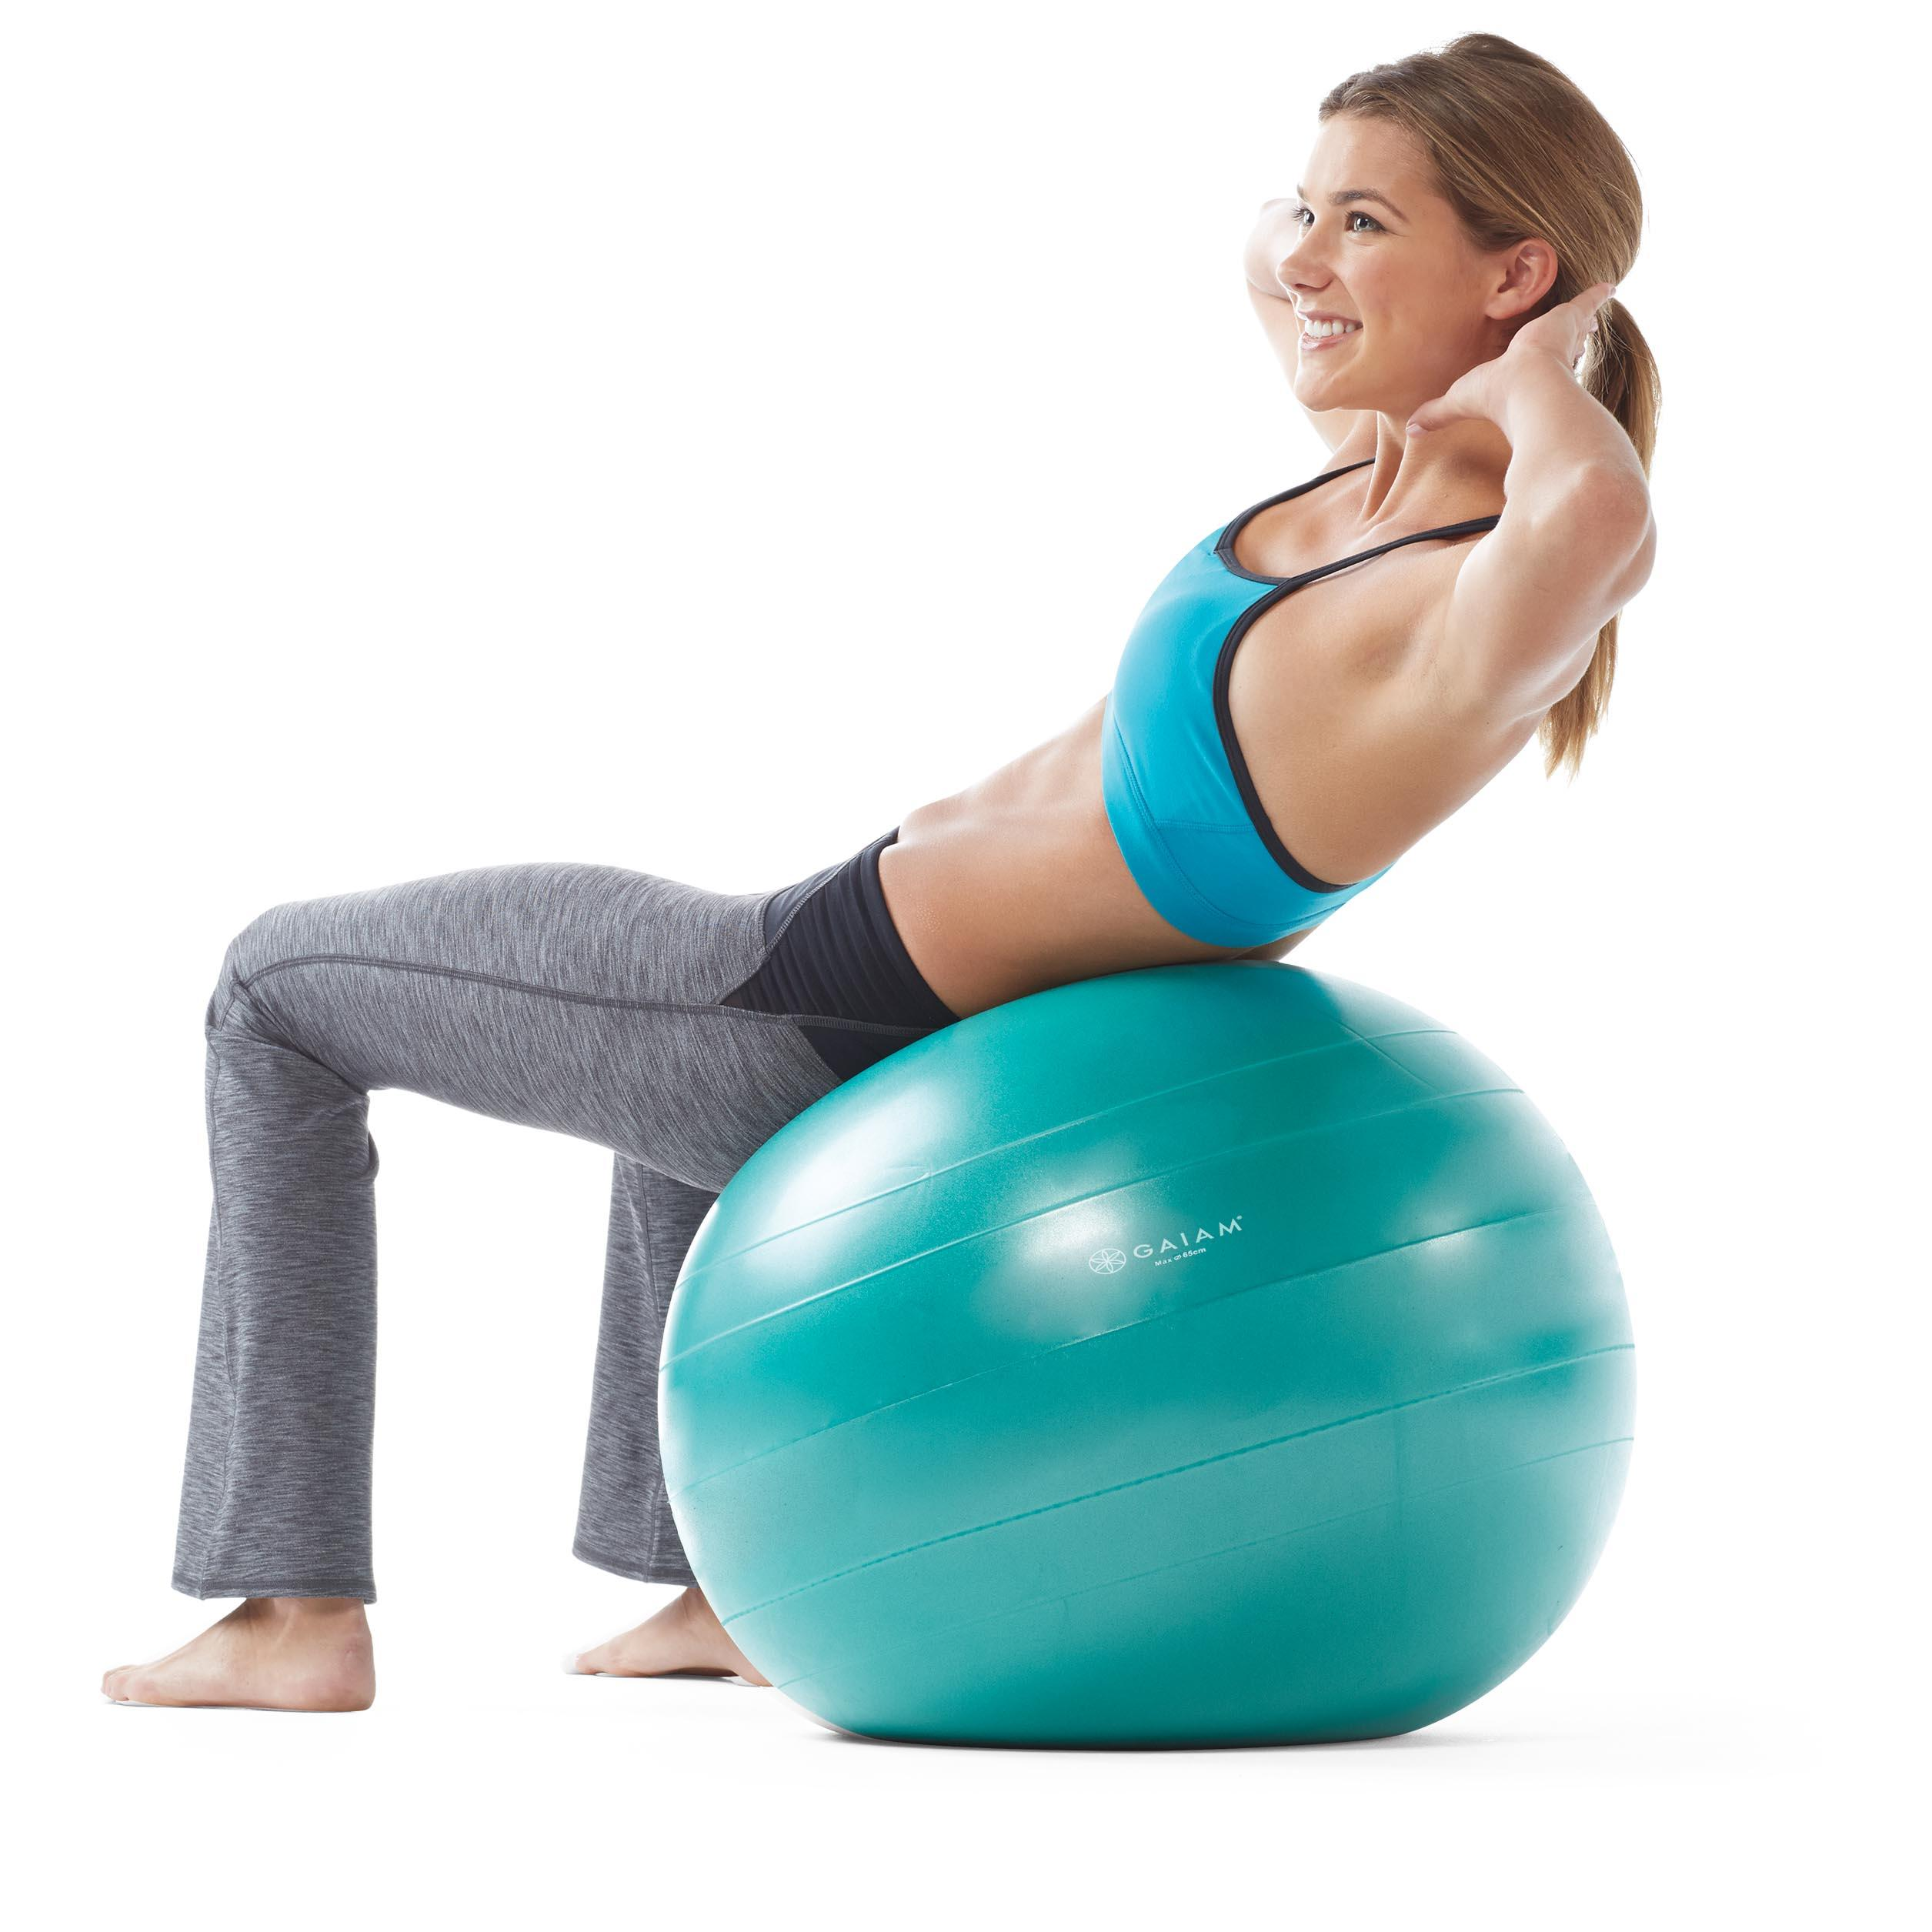 Balance Ball Dvd: Amazon.com : Gaiam Total Body Balance Ball Kit